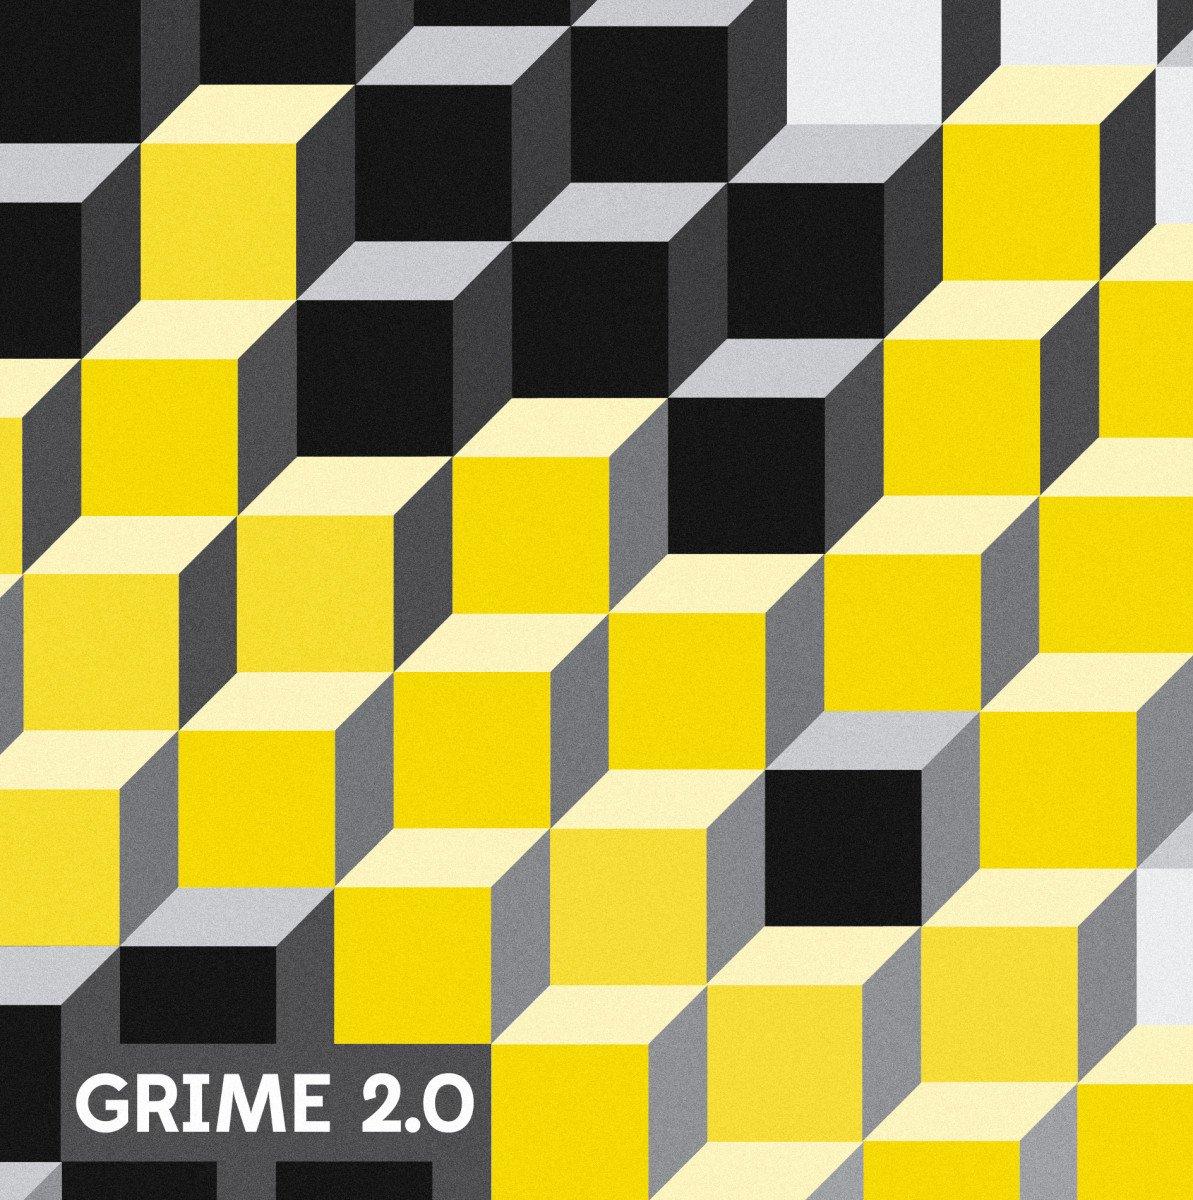 Grime 2.0 Arlington Mall Recommendation